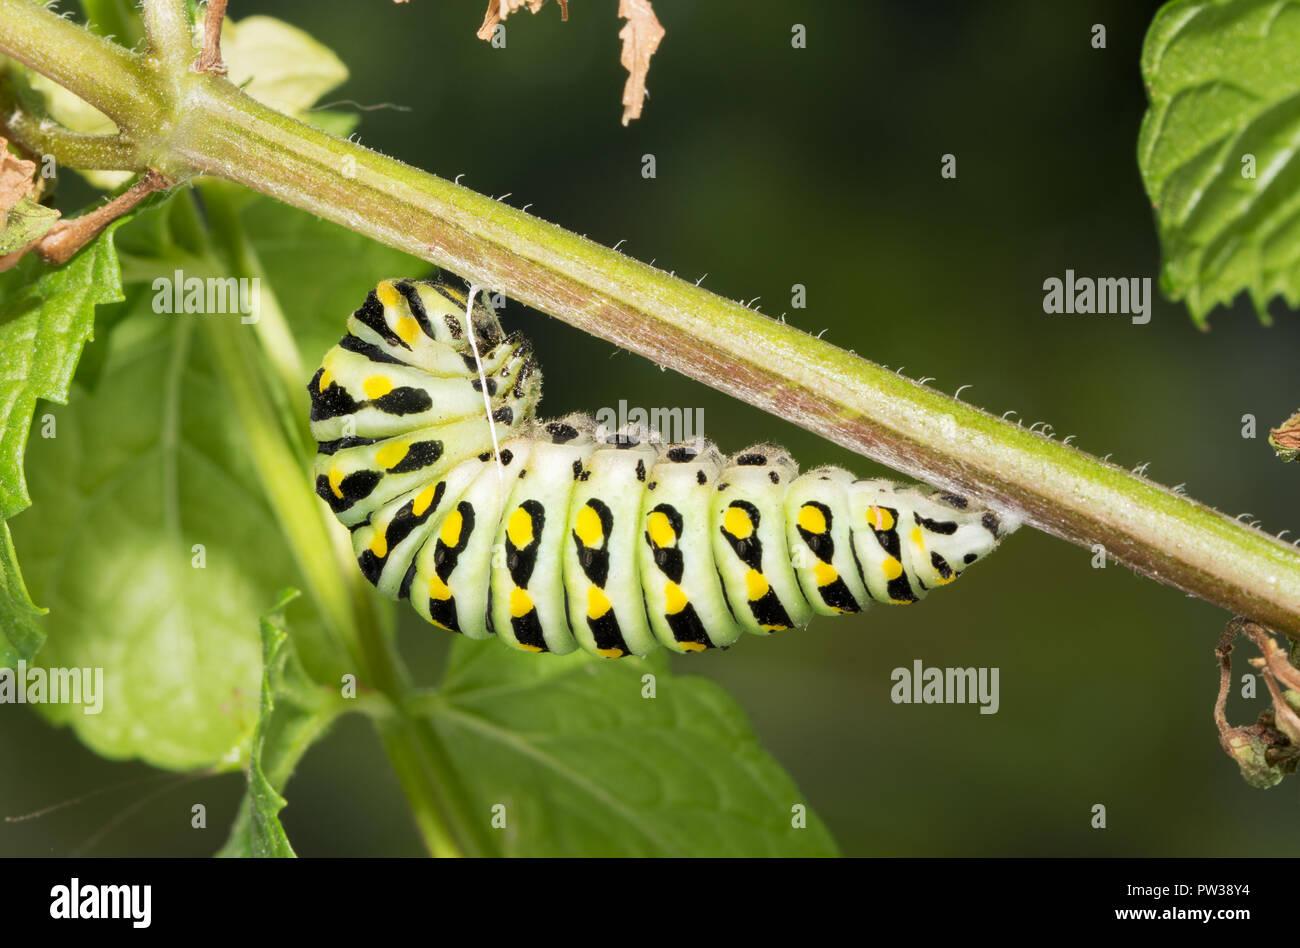 Último estadio de especie butterfly caterpillar alistándose a pupa, colgando de un tallo de menta Foto de stock